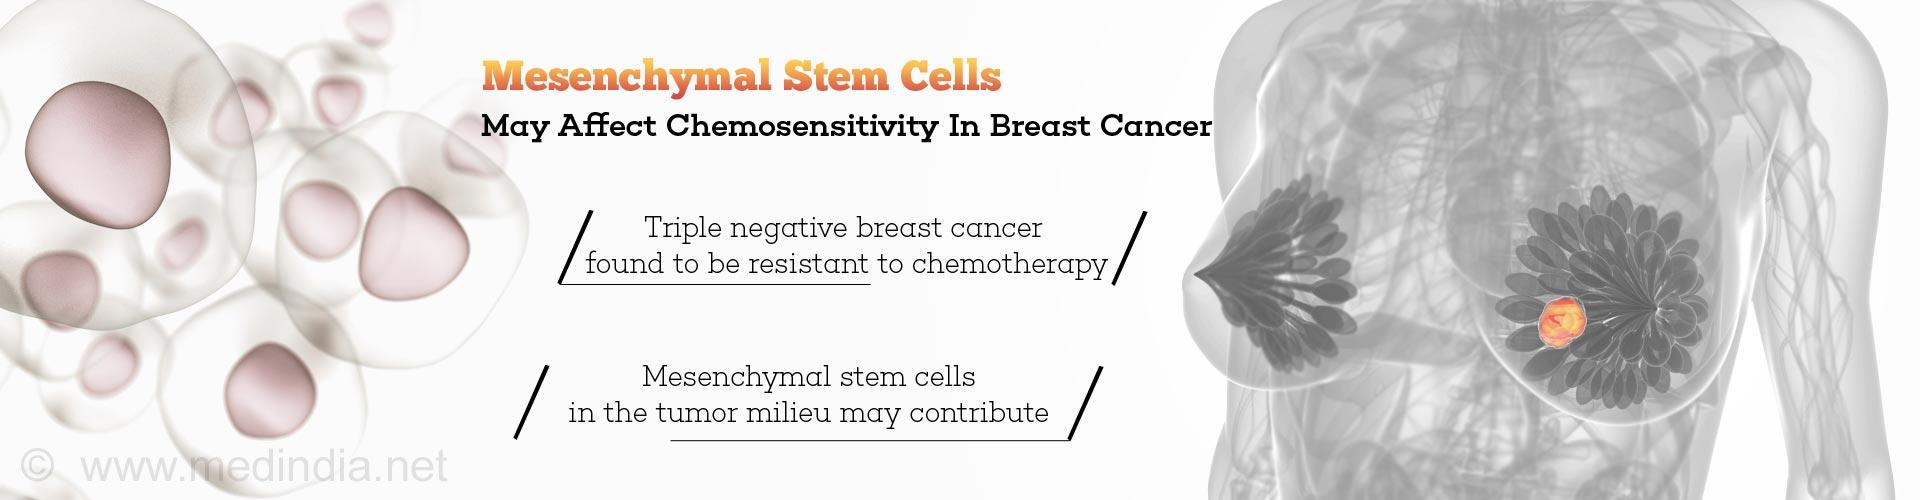 Chemo-resistance in Triple Negative Breast Cancer Linked To Mesenchymal Stem Cells In Tumor